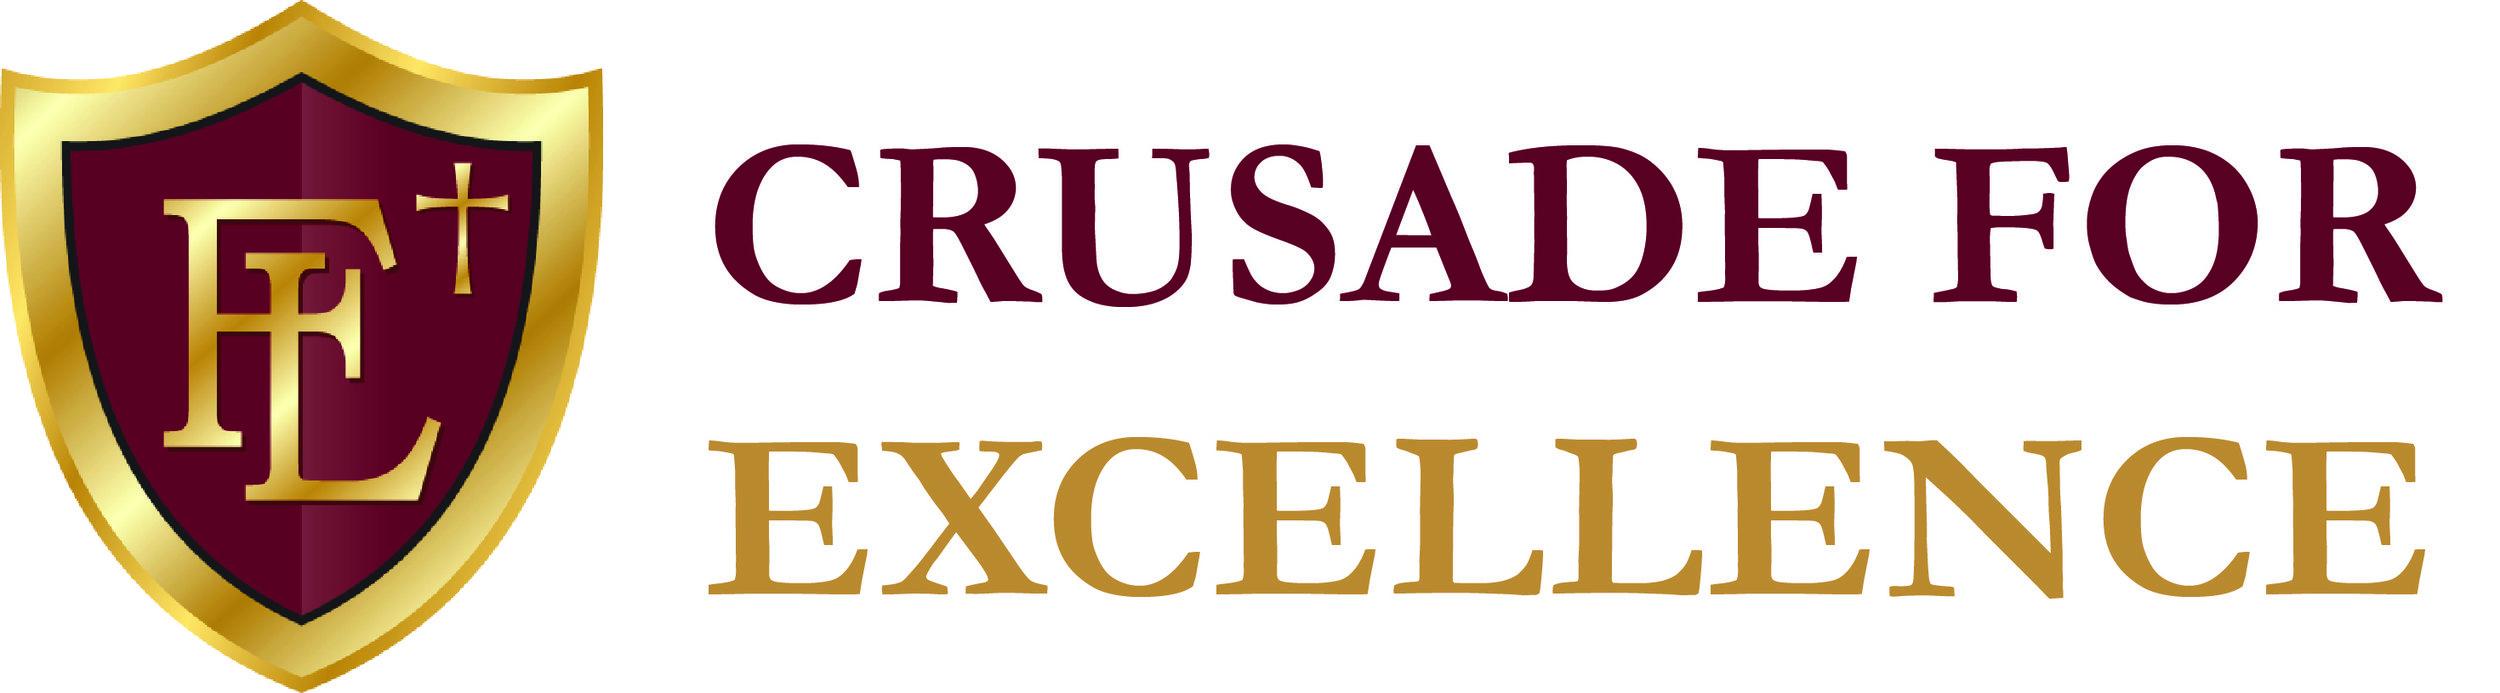 Crusade_for_Excellence_Logo_FINAL.jpg